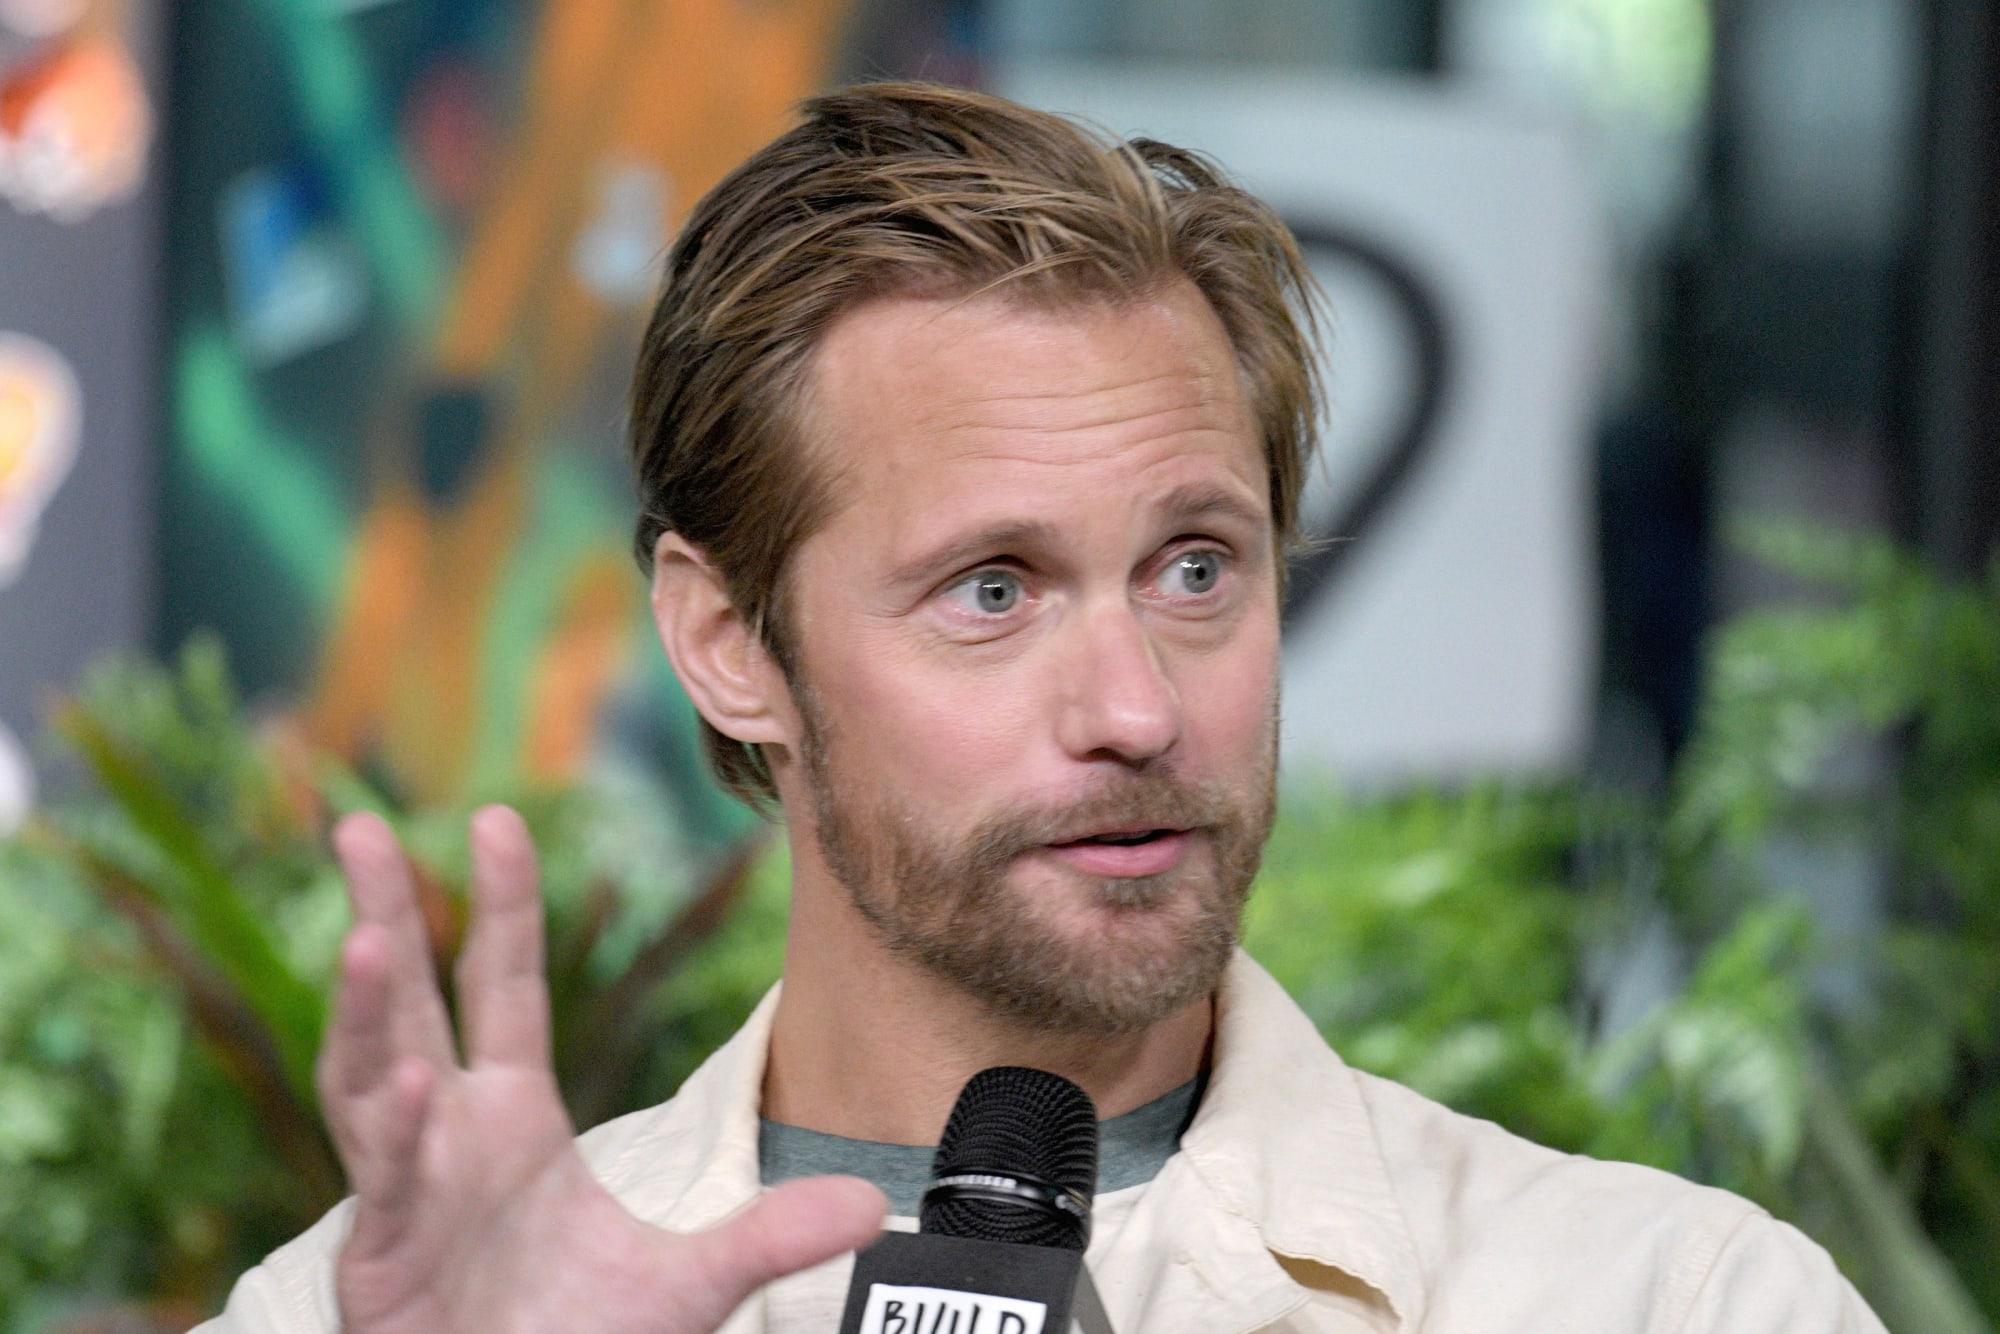 HBO's Succession Season 3 to feature Alexander Skarsgård